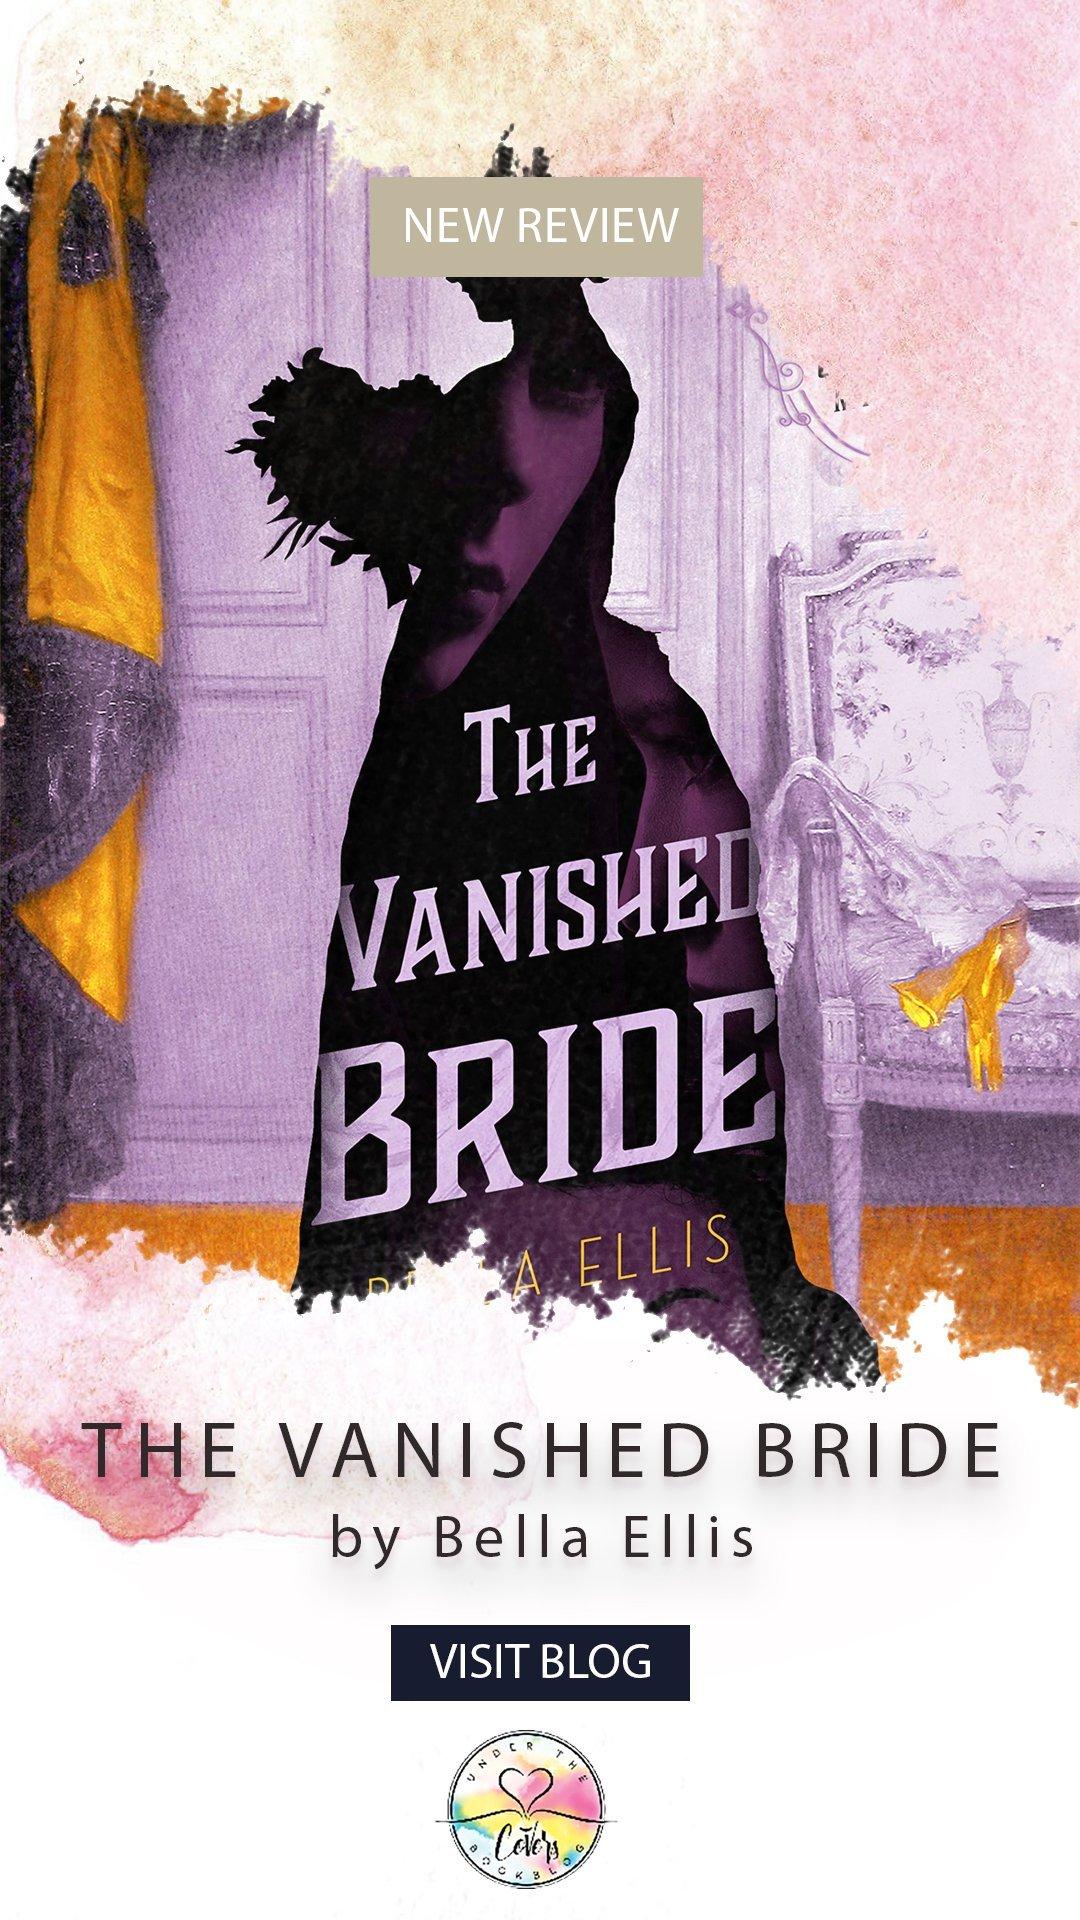 ARC Review: The Vanished Bride by Bella Ellis